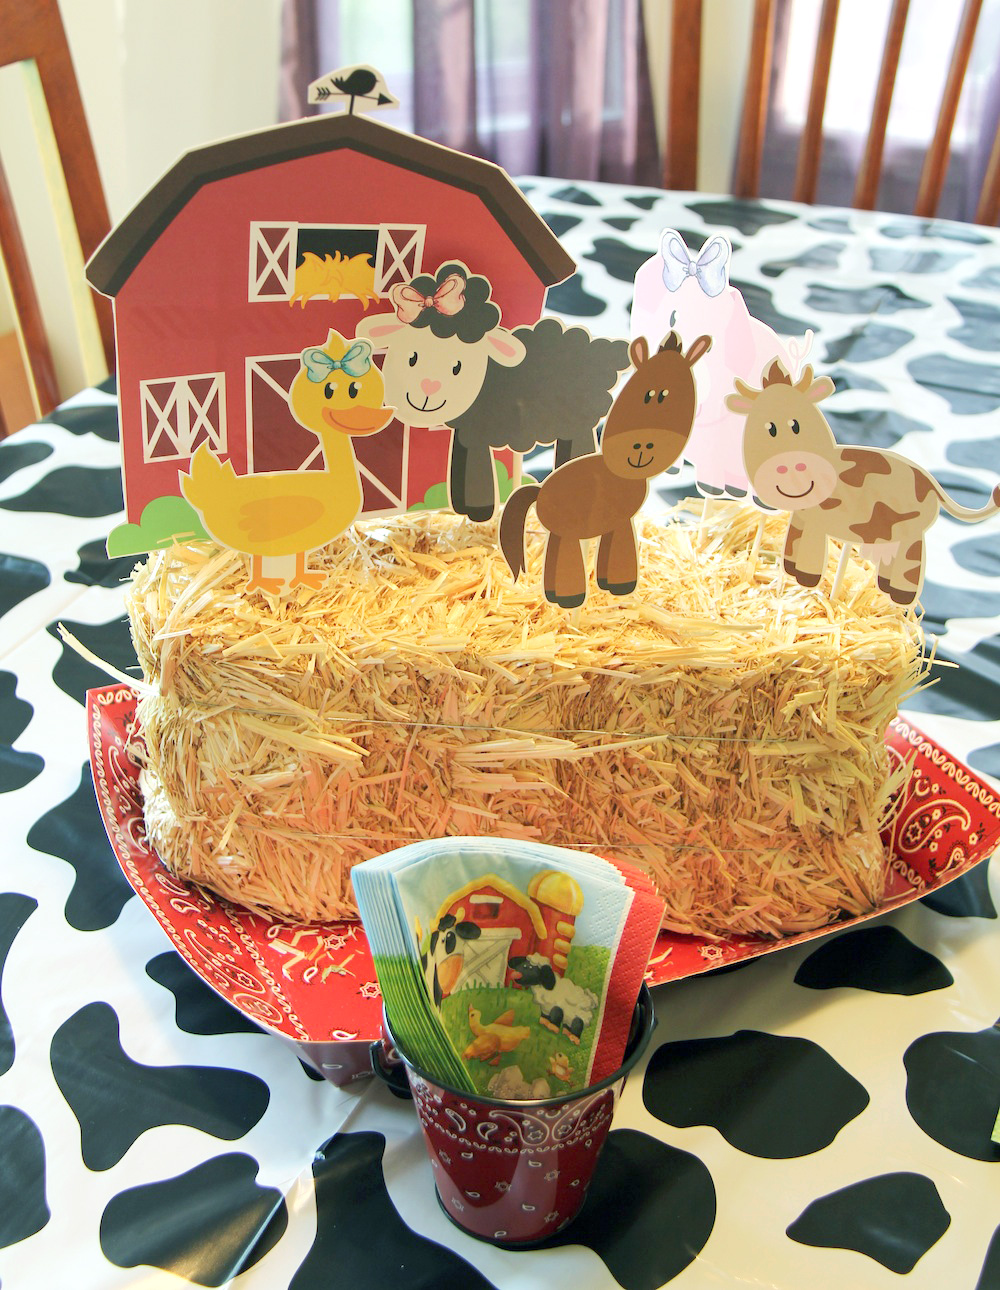 DIY : Easy and Fun Barn Themed Birthday Party Centerpiece